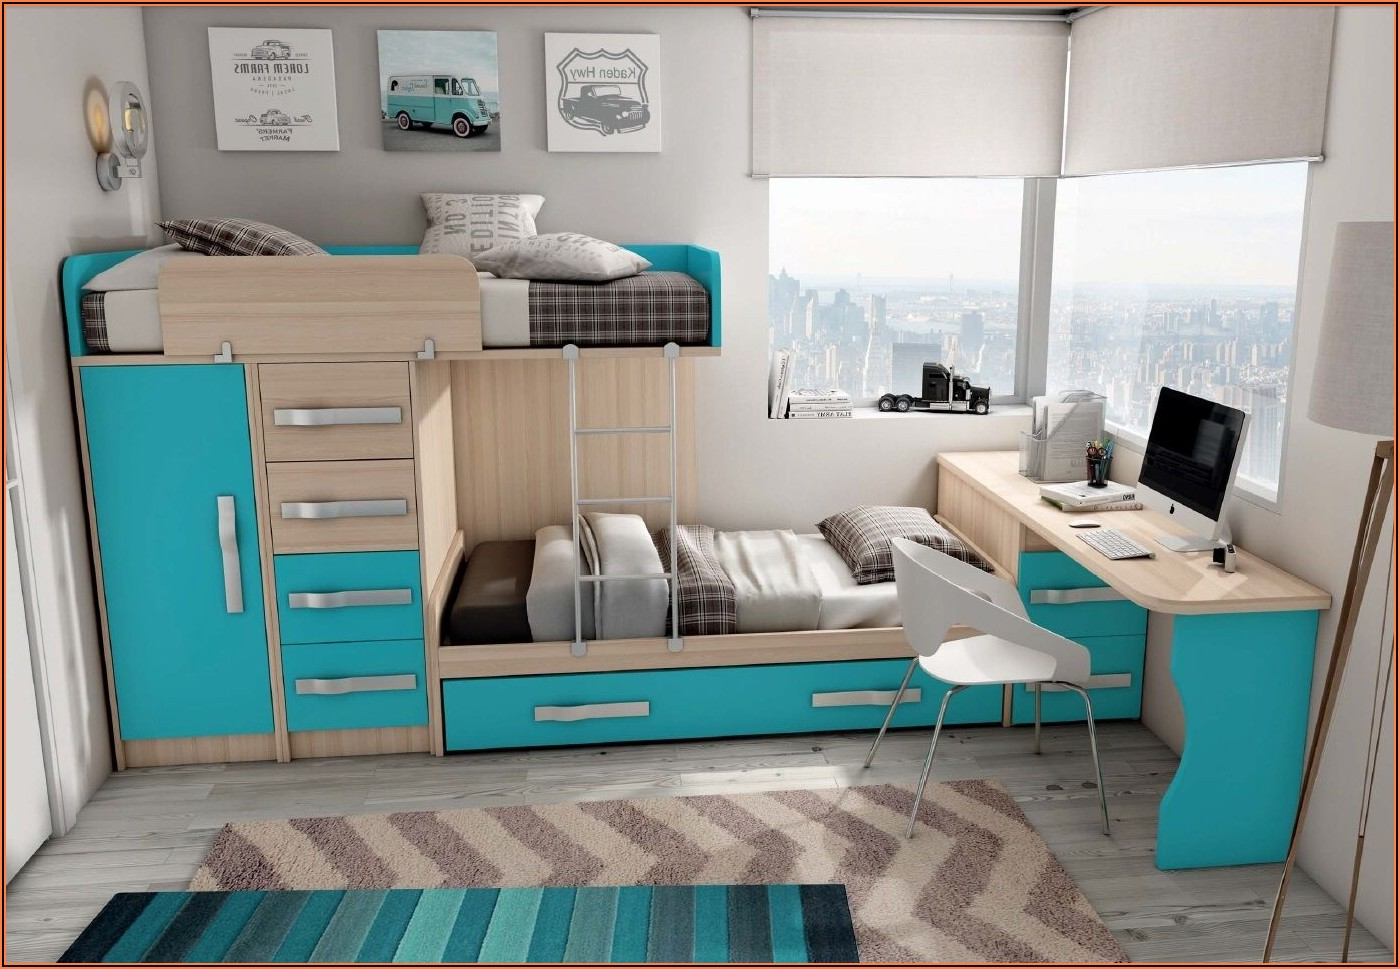 Kinderzimmer Komplett Mit Doppelbett